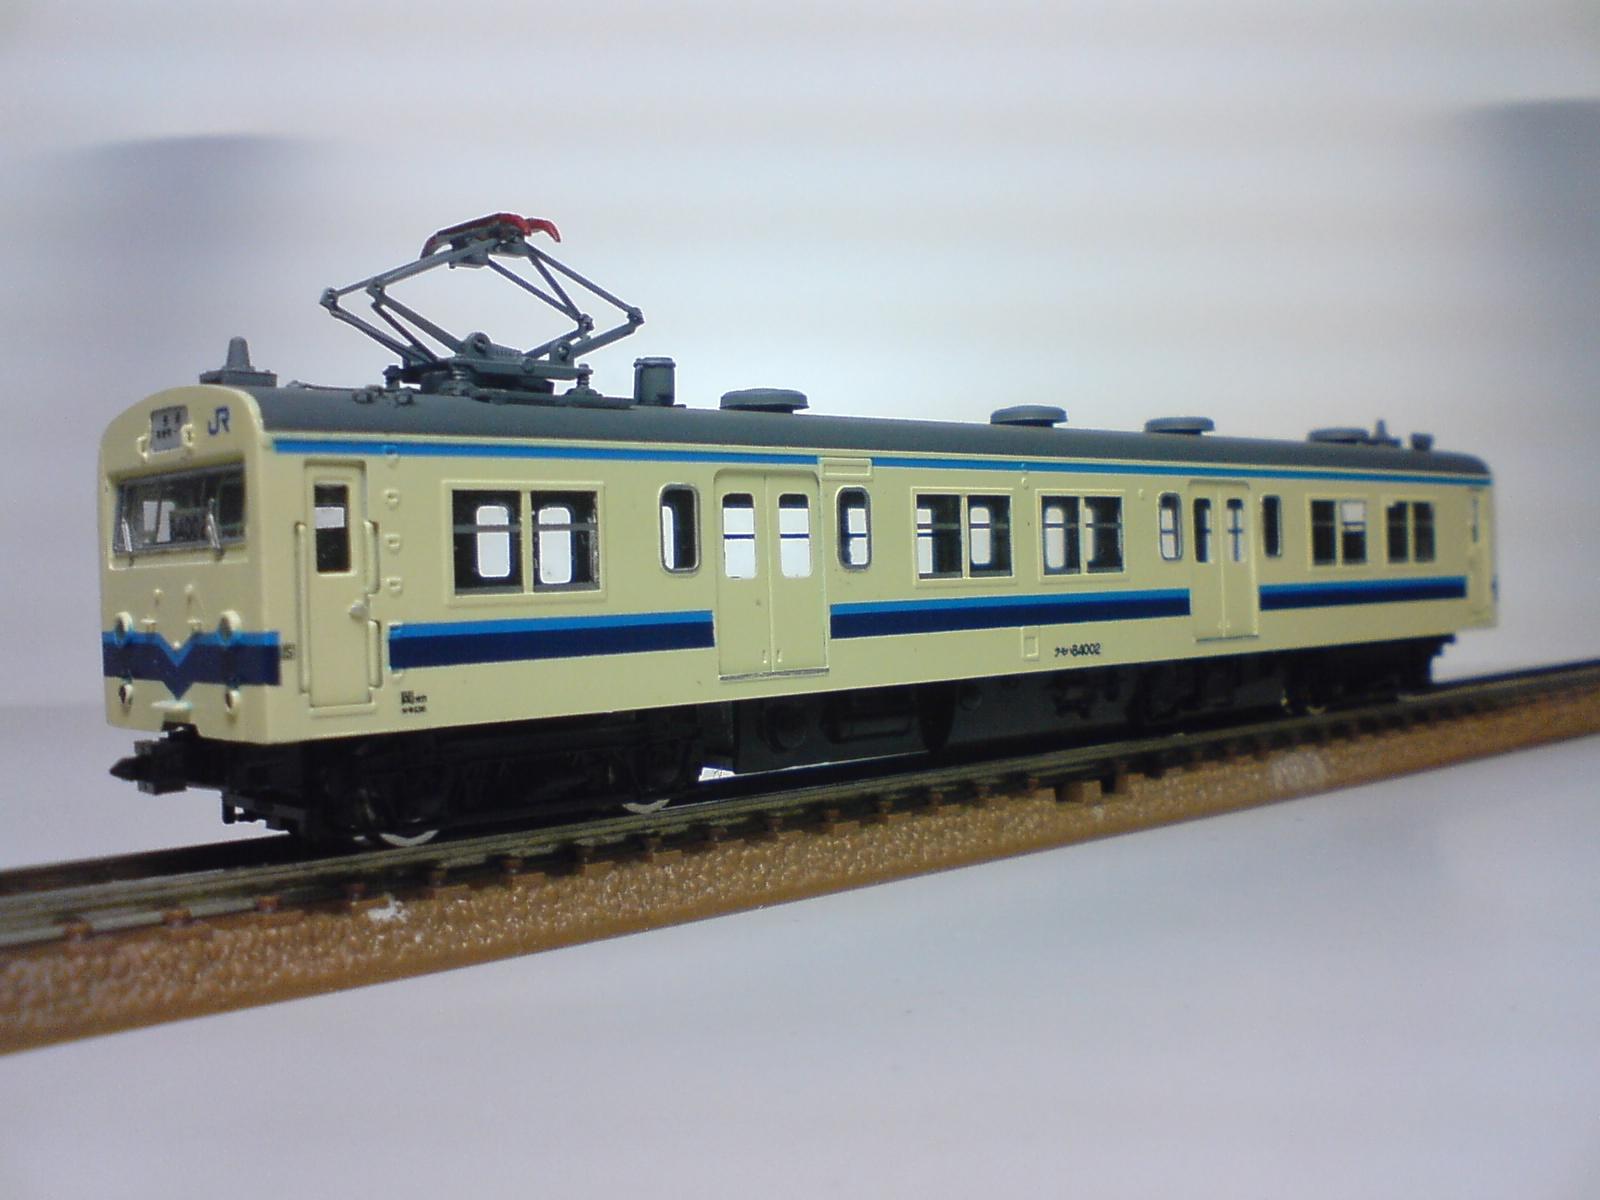 Kc380007